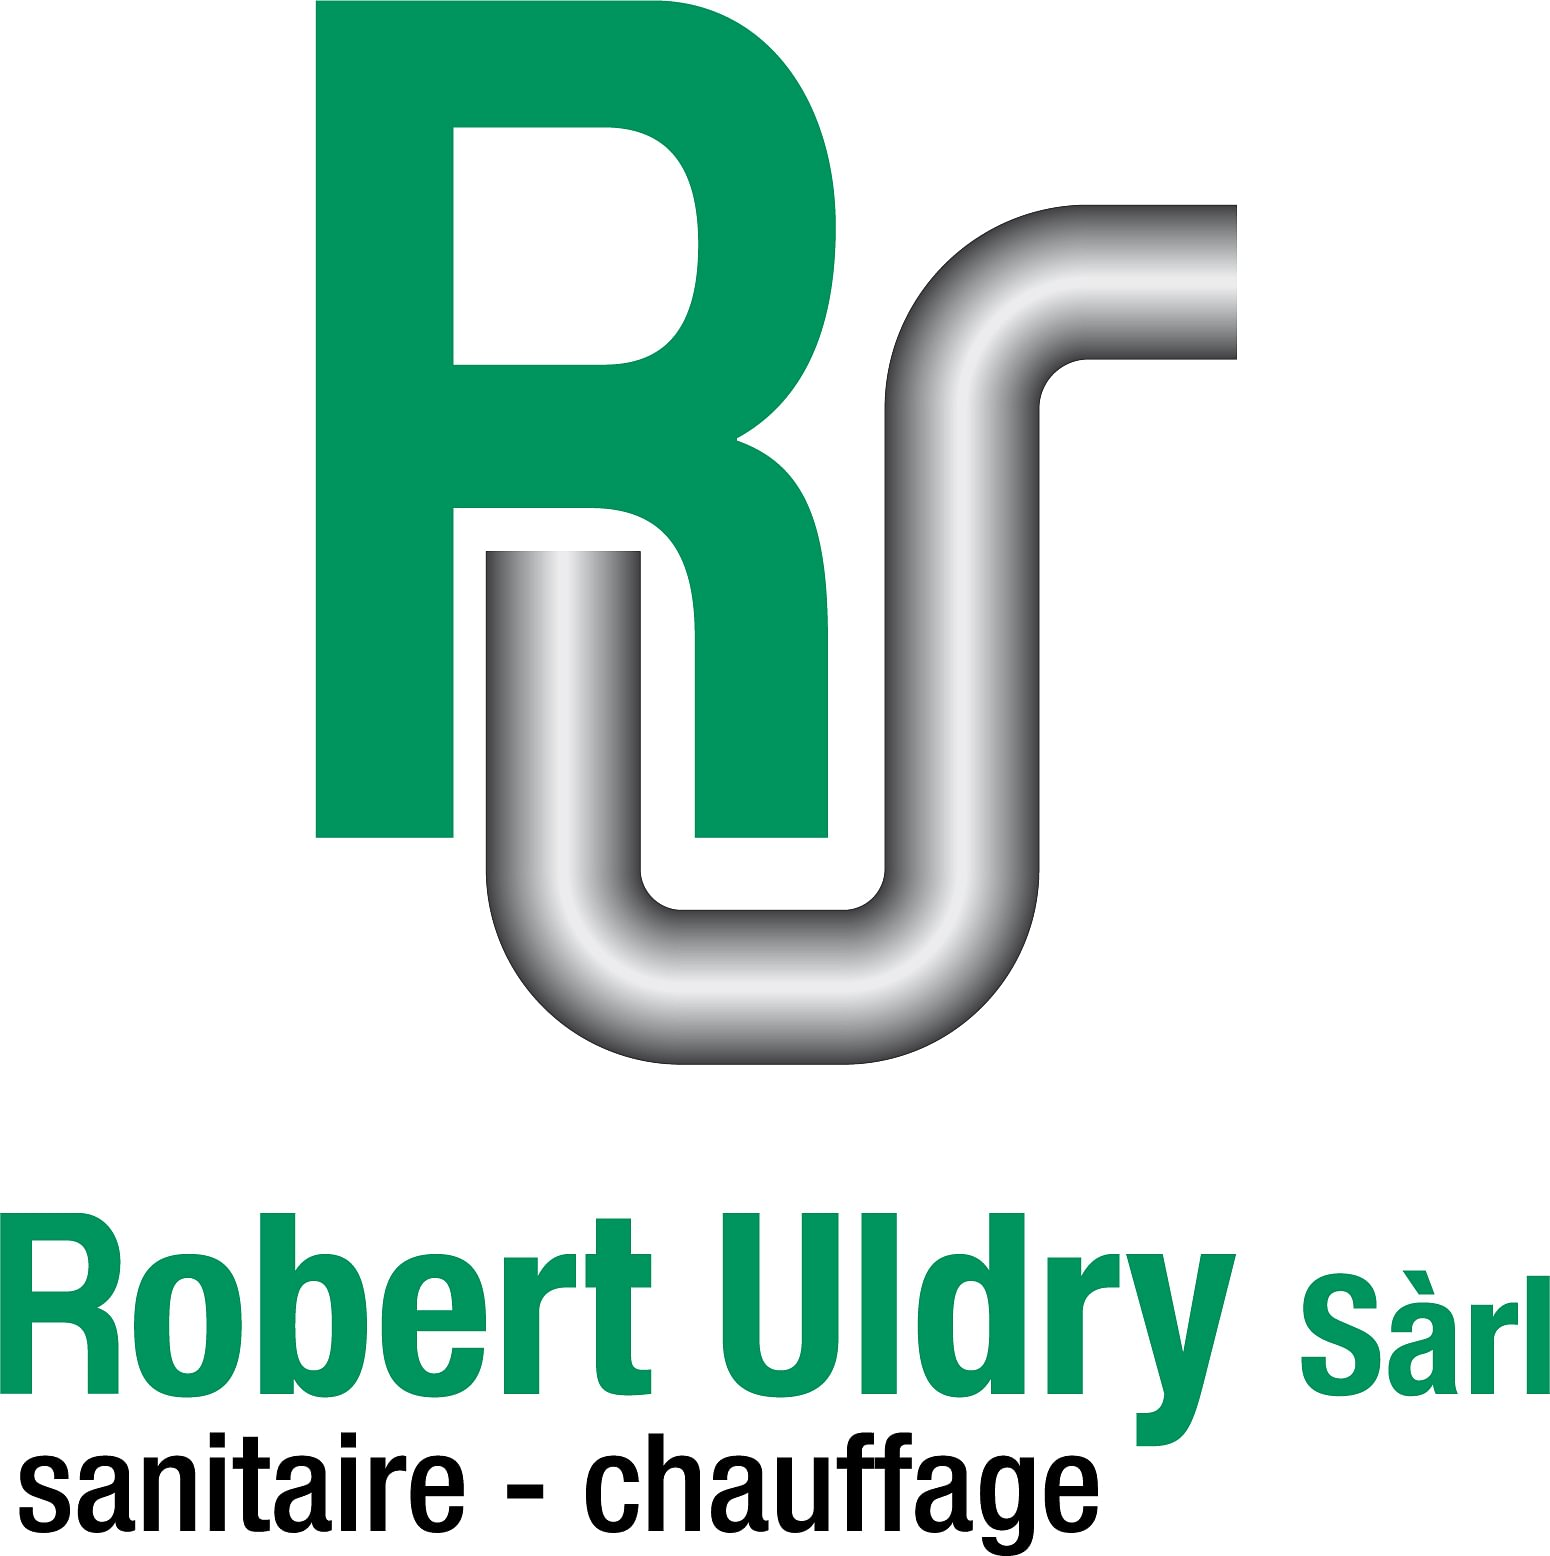 Uldry Robert Sàrl, Sanitaire & chauffage